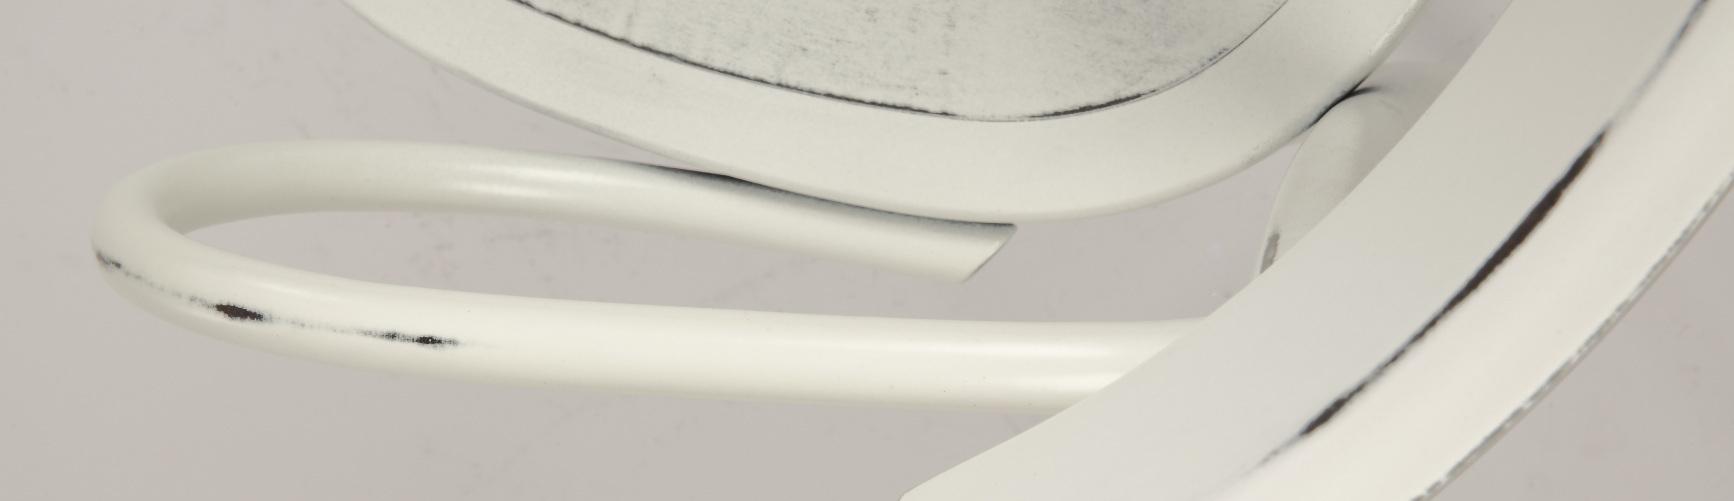 stuhle-contract-design-madeinitaly-sedia-elite-srl